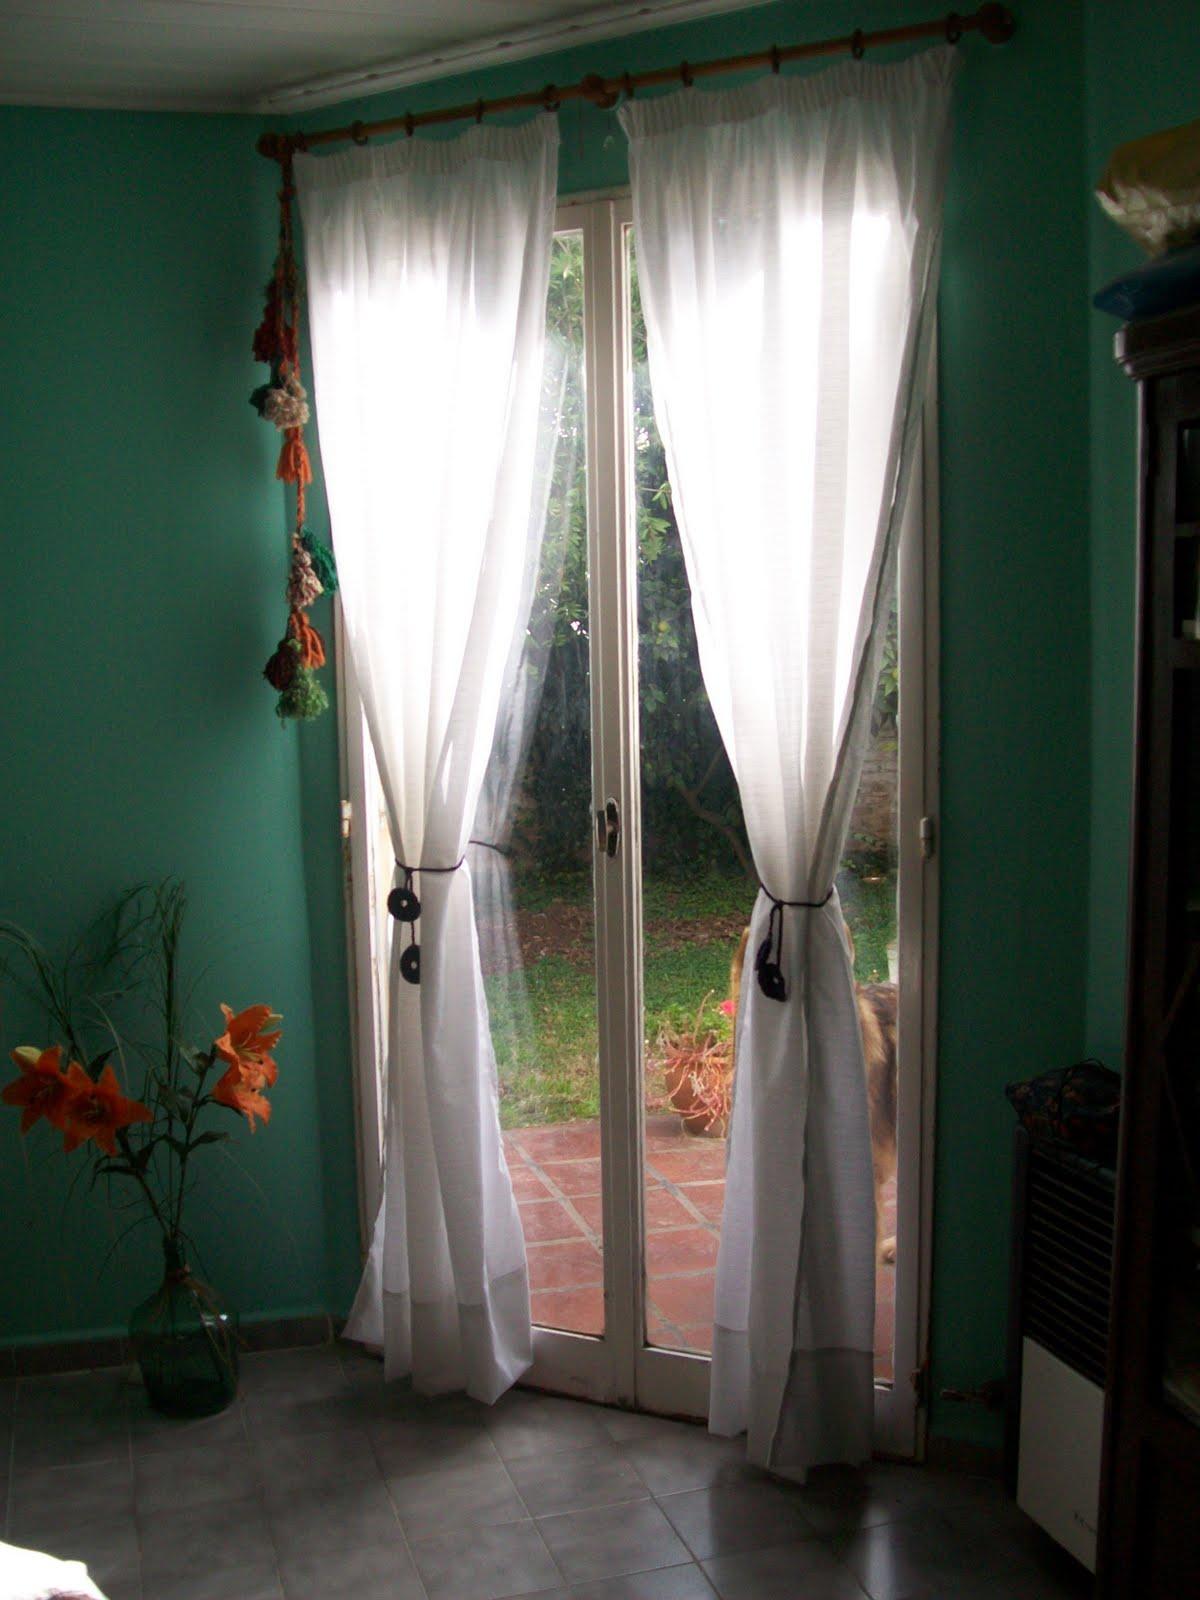 Abuela cata tejido de dise o junio 2011 - Alzapanos para cortinas ...